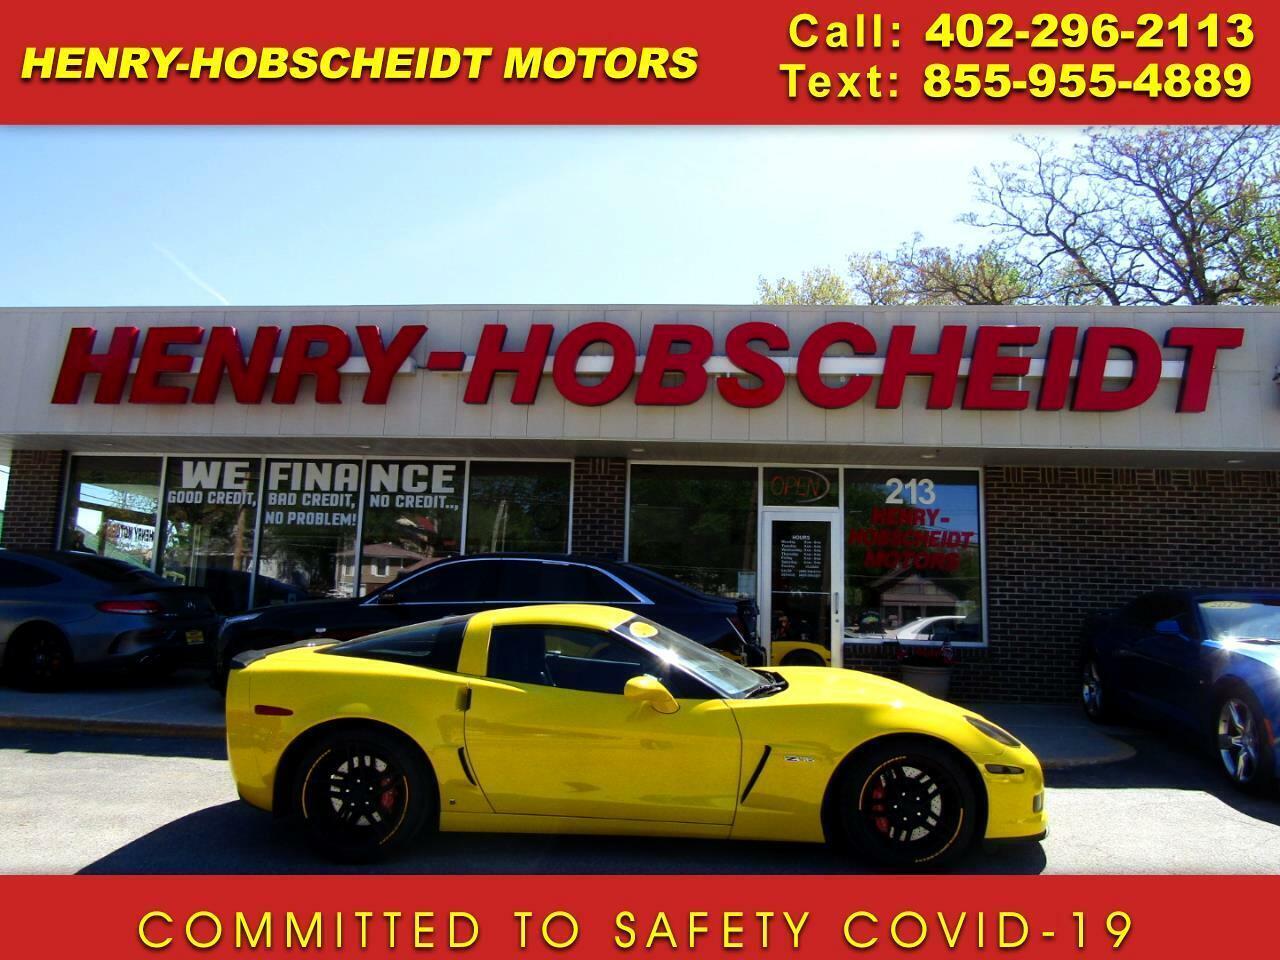 2006 Yellow Chevrolet Corvette Z06  | C6 Corvette Photo 1